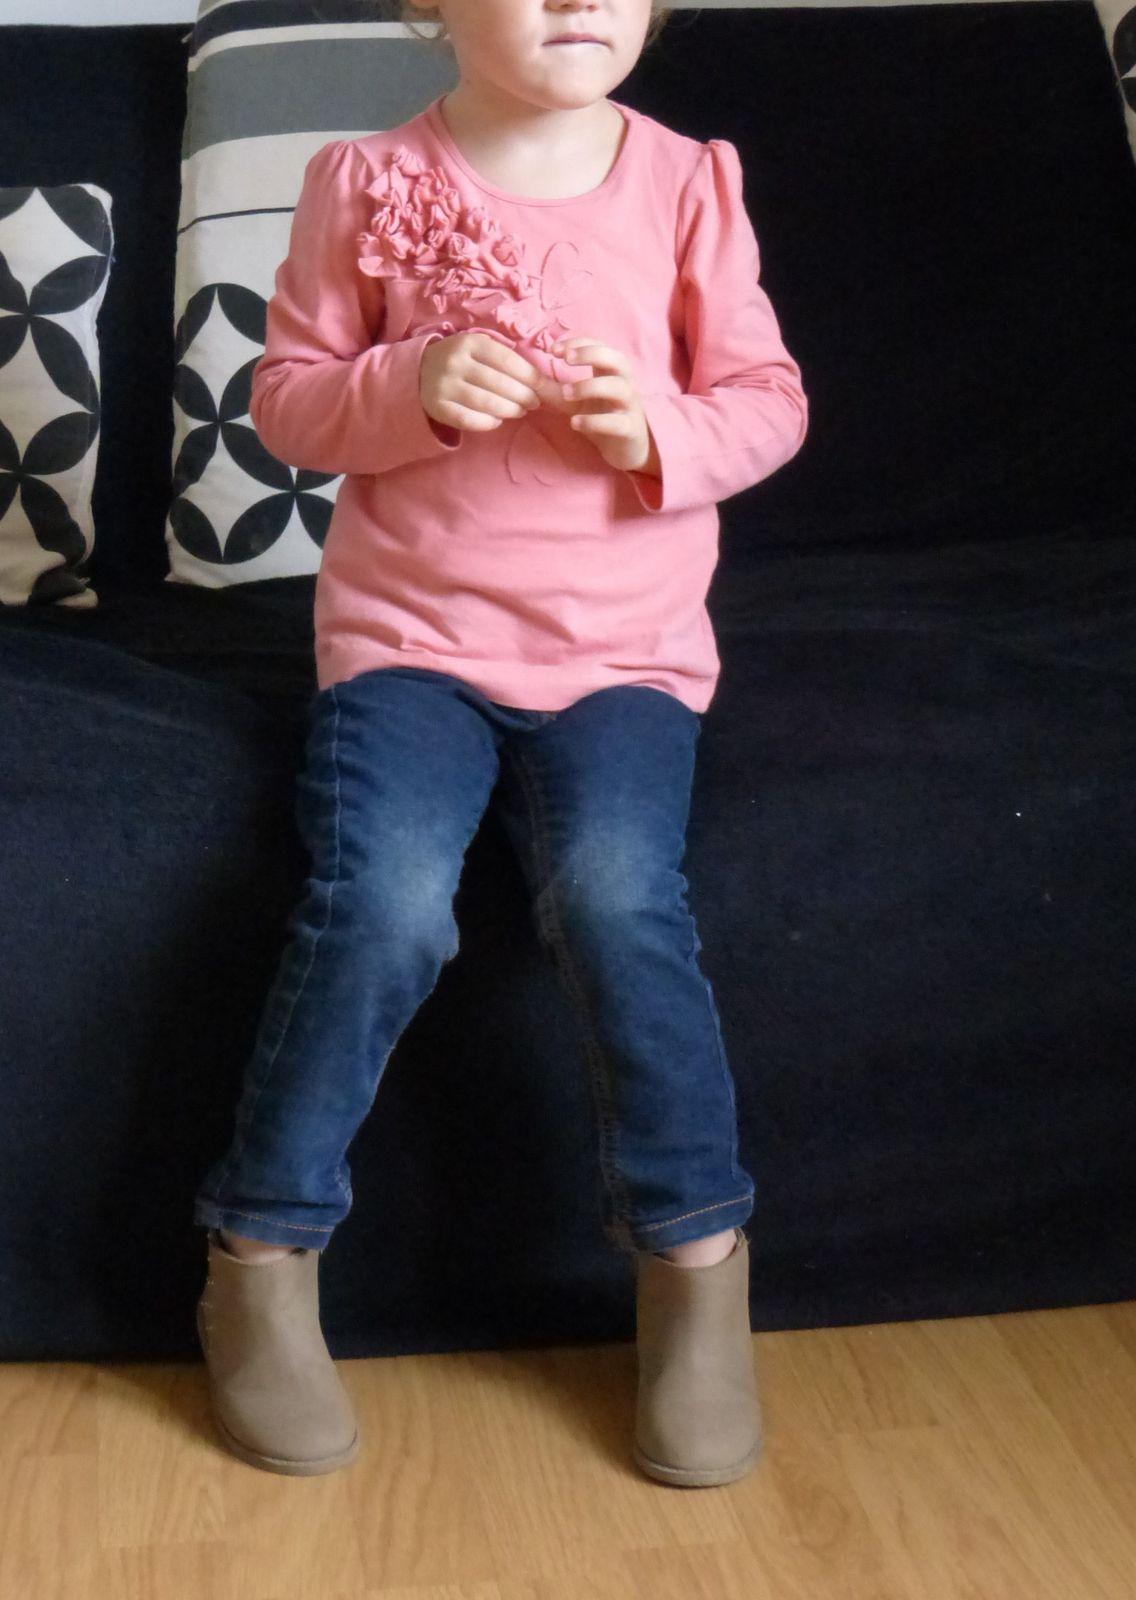 Tee-shirt rose Zara Kids, jean brut Tape à l'oeil, boots grises à clous Zara.